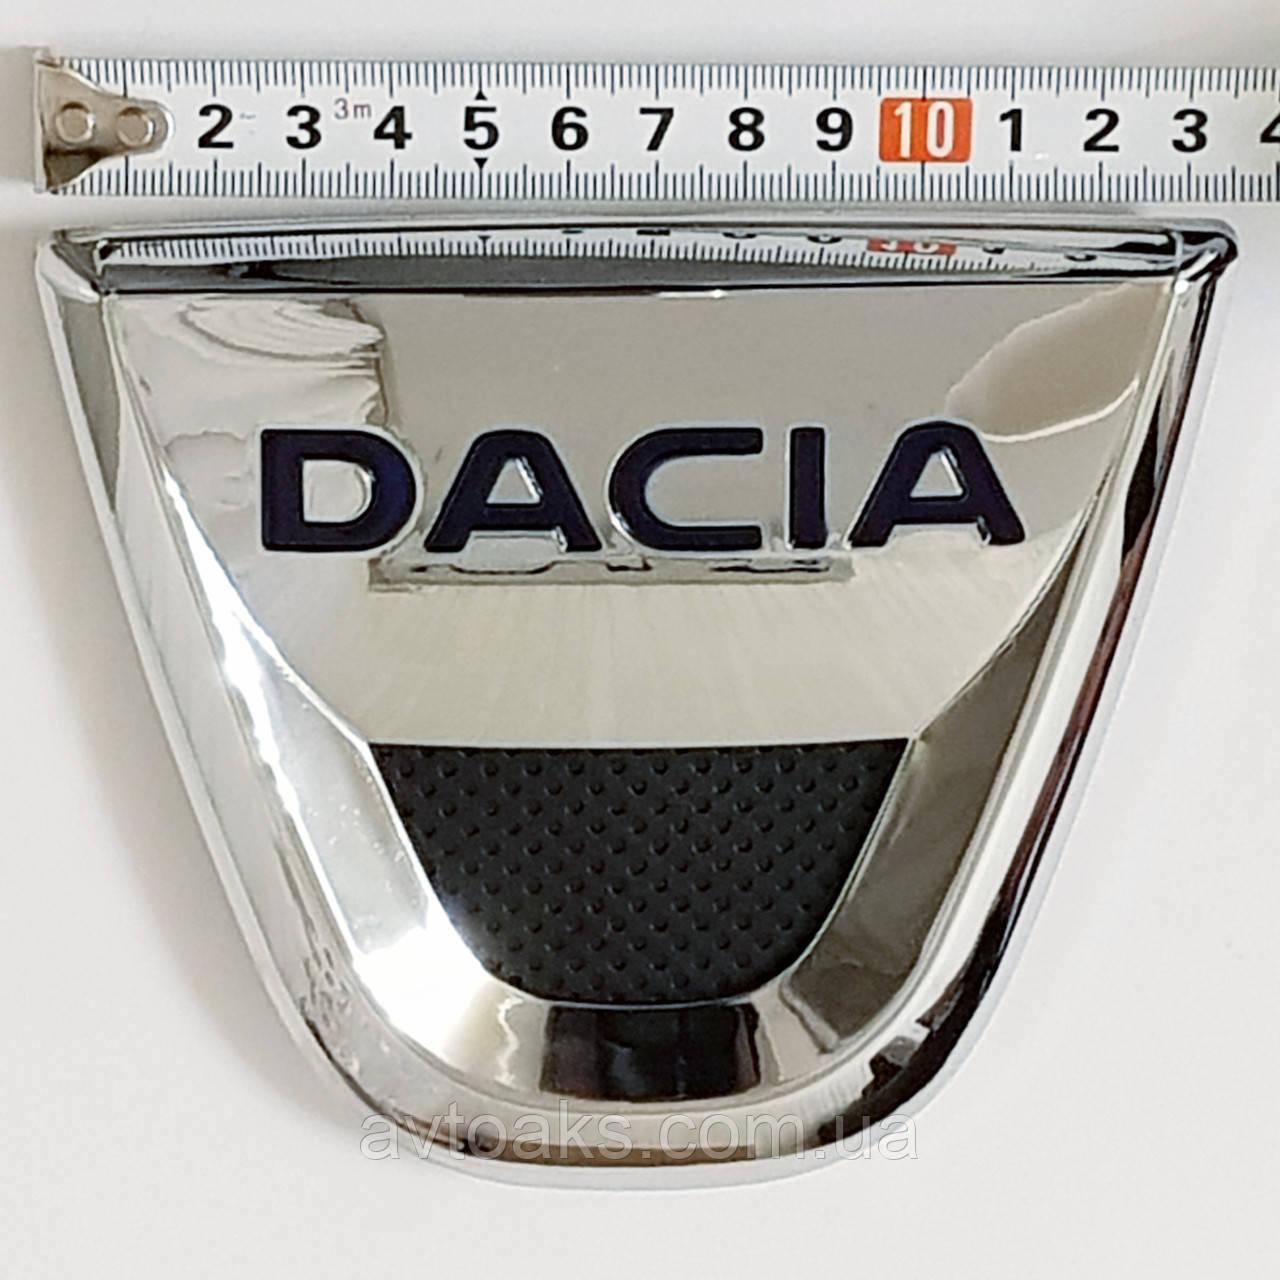 Эмблема Dacia Sandero, Stepway, Duster, Lodgy, Dokker 137х120 мм. перед. хром